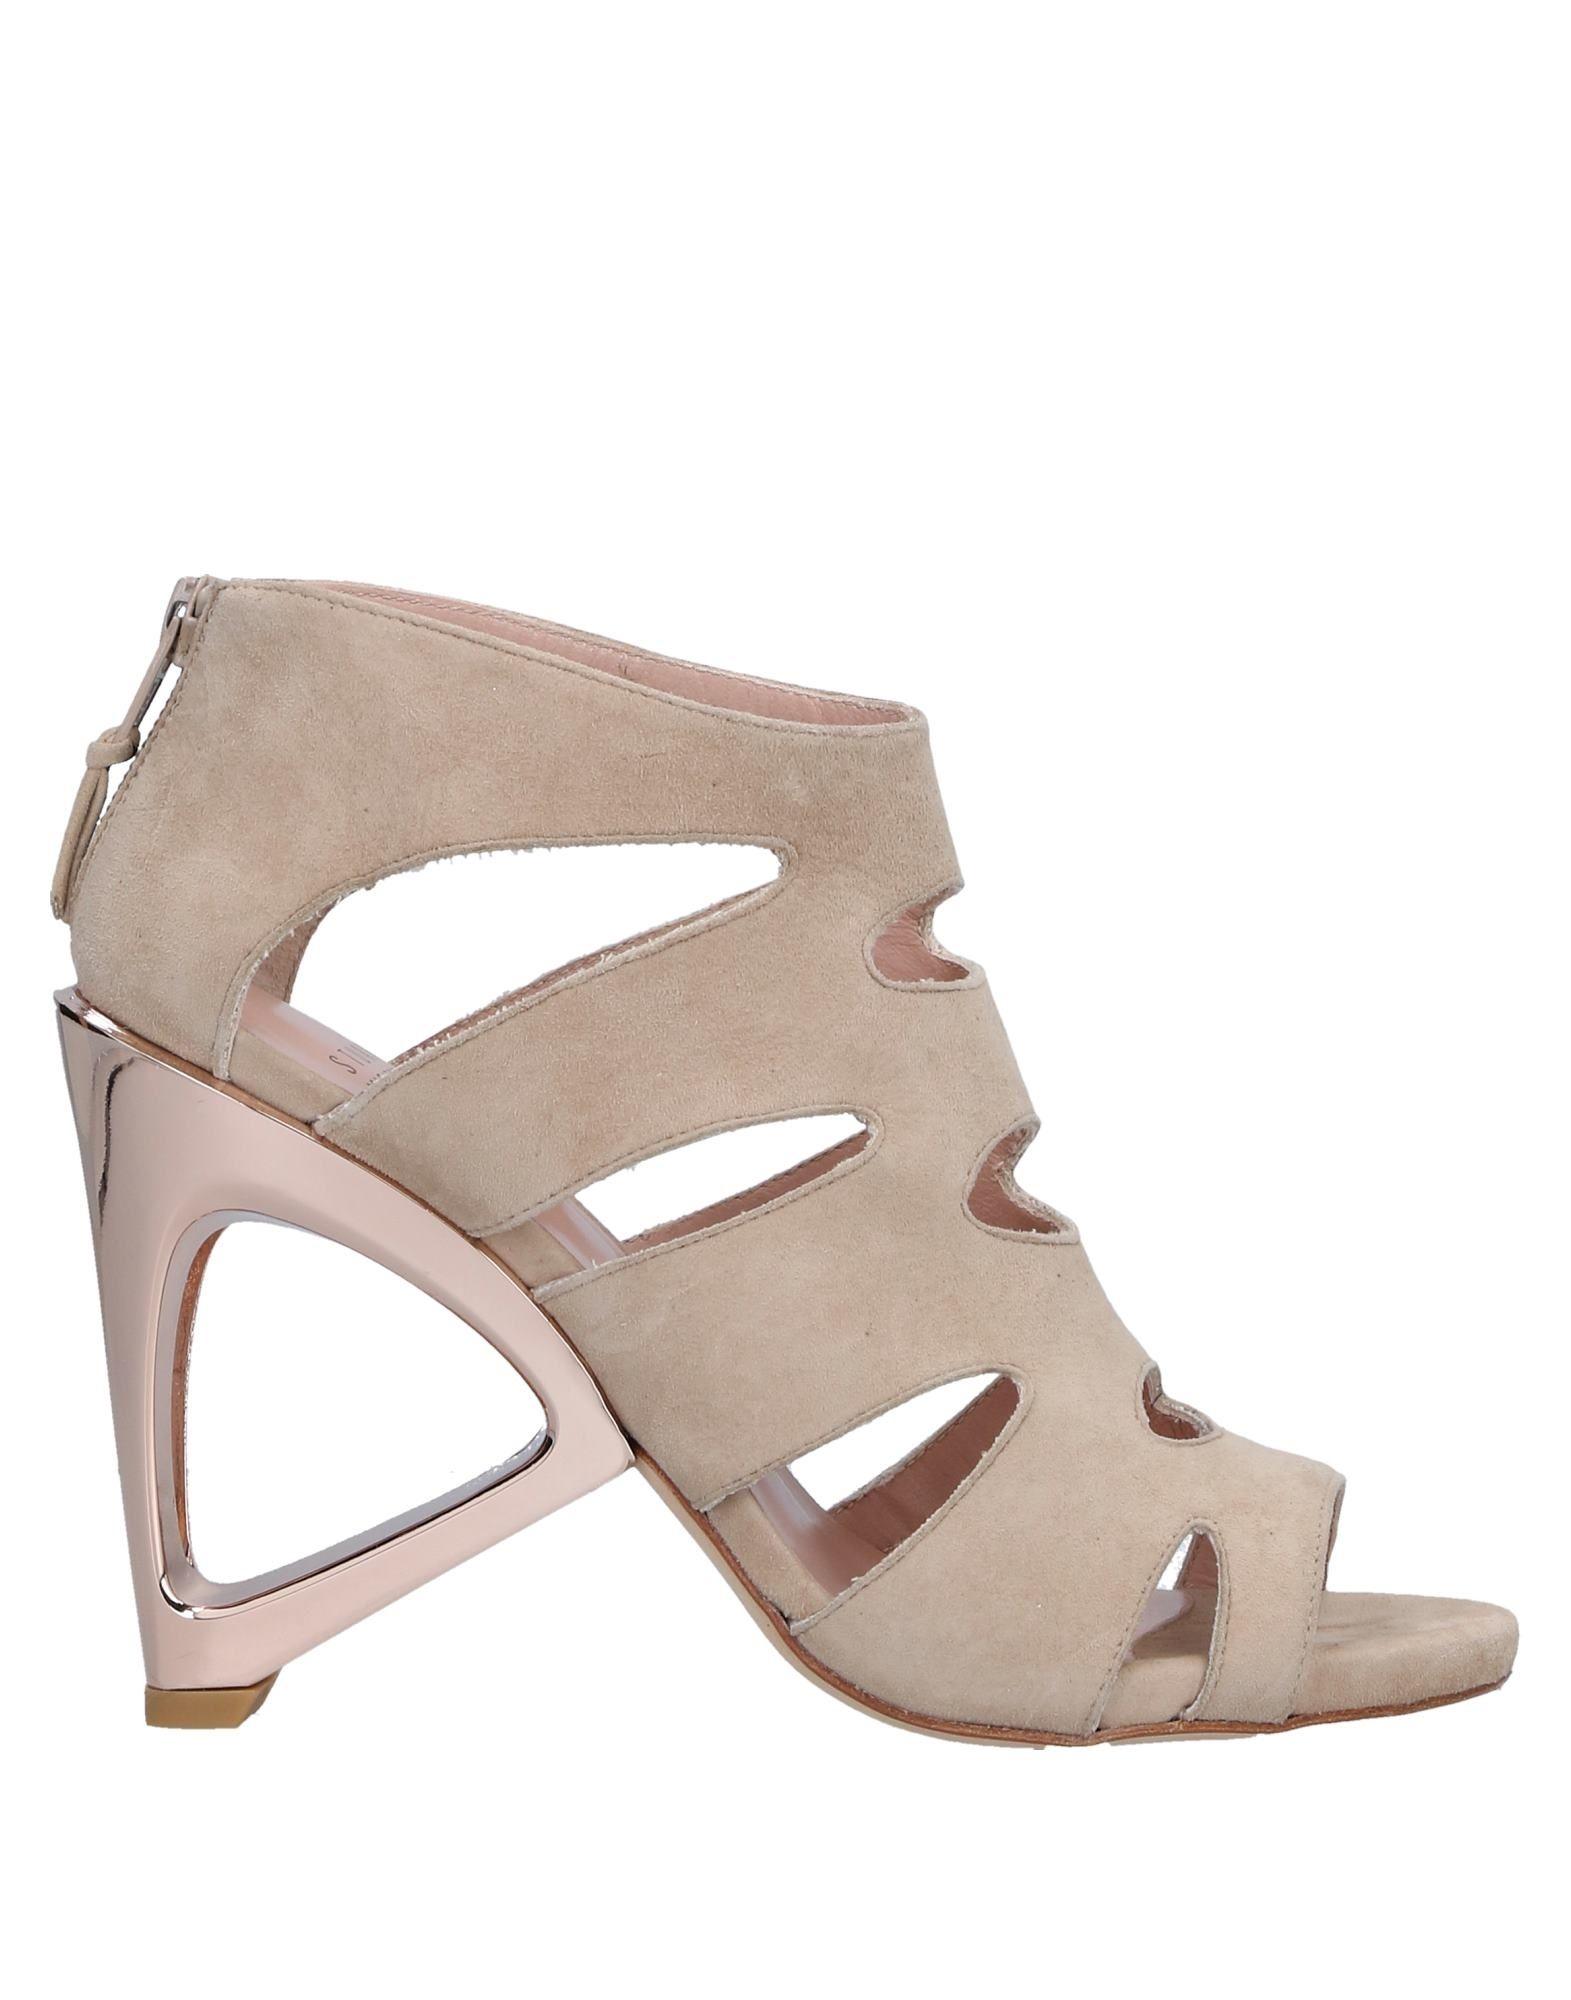 Stuart Weitzman Sandalen Damen  11183078TB Beliebte Schuhe